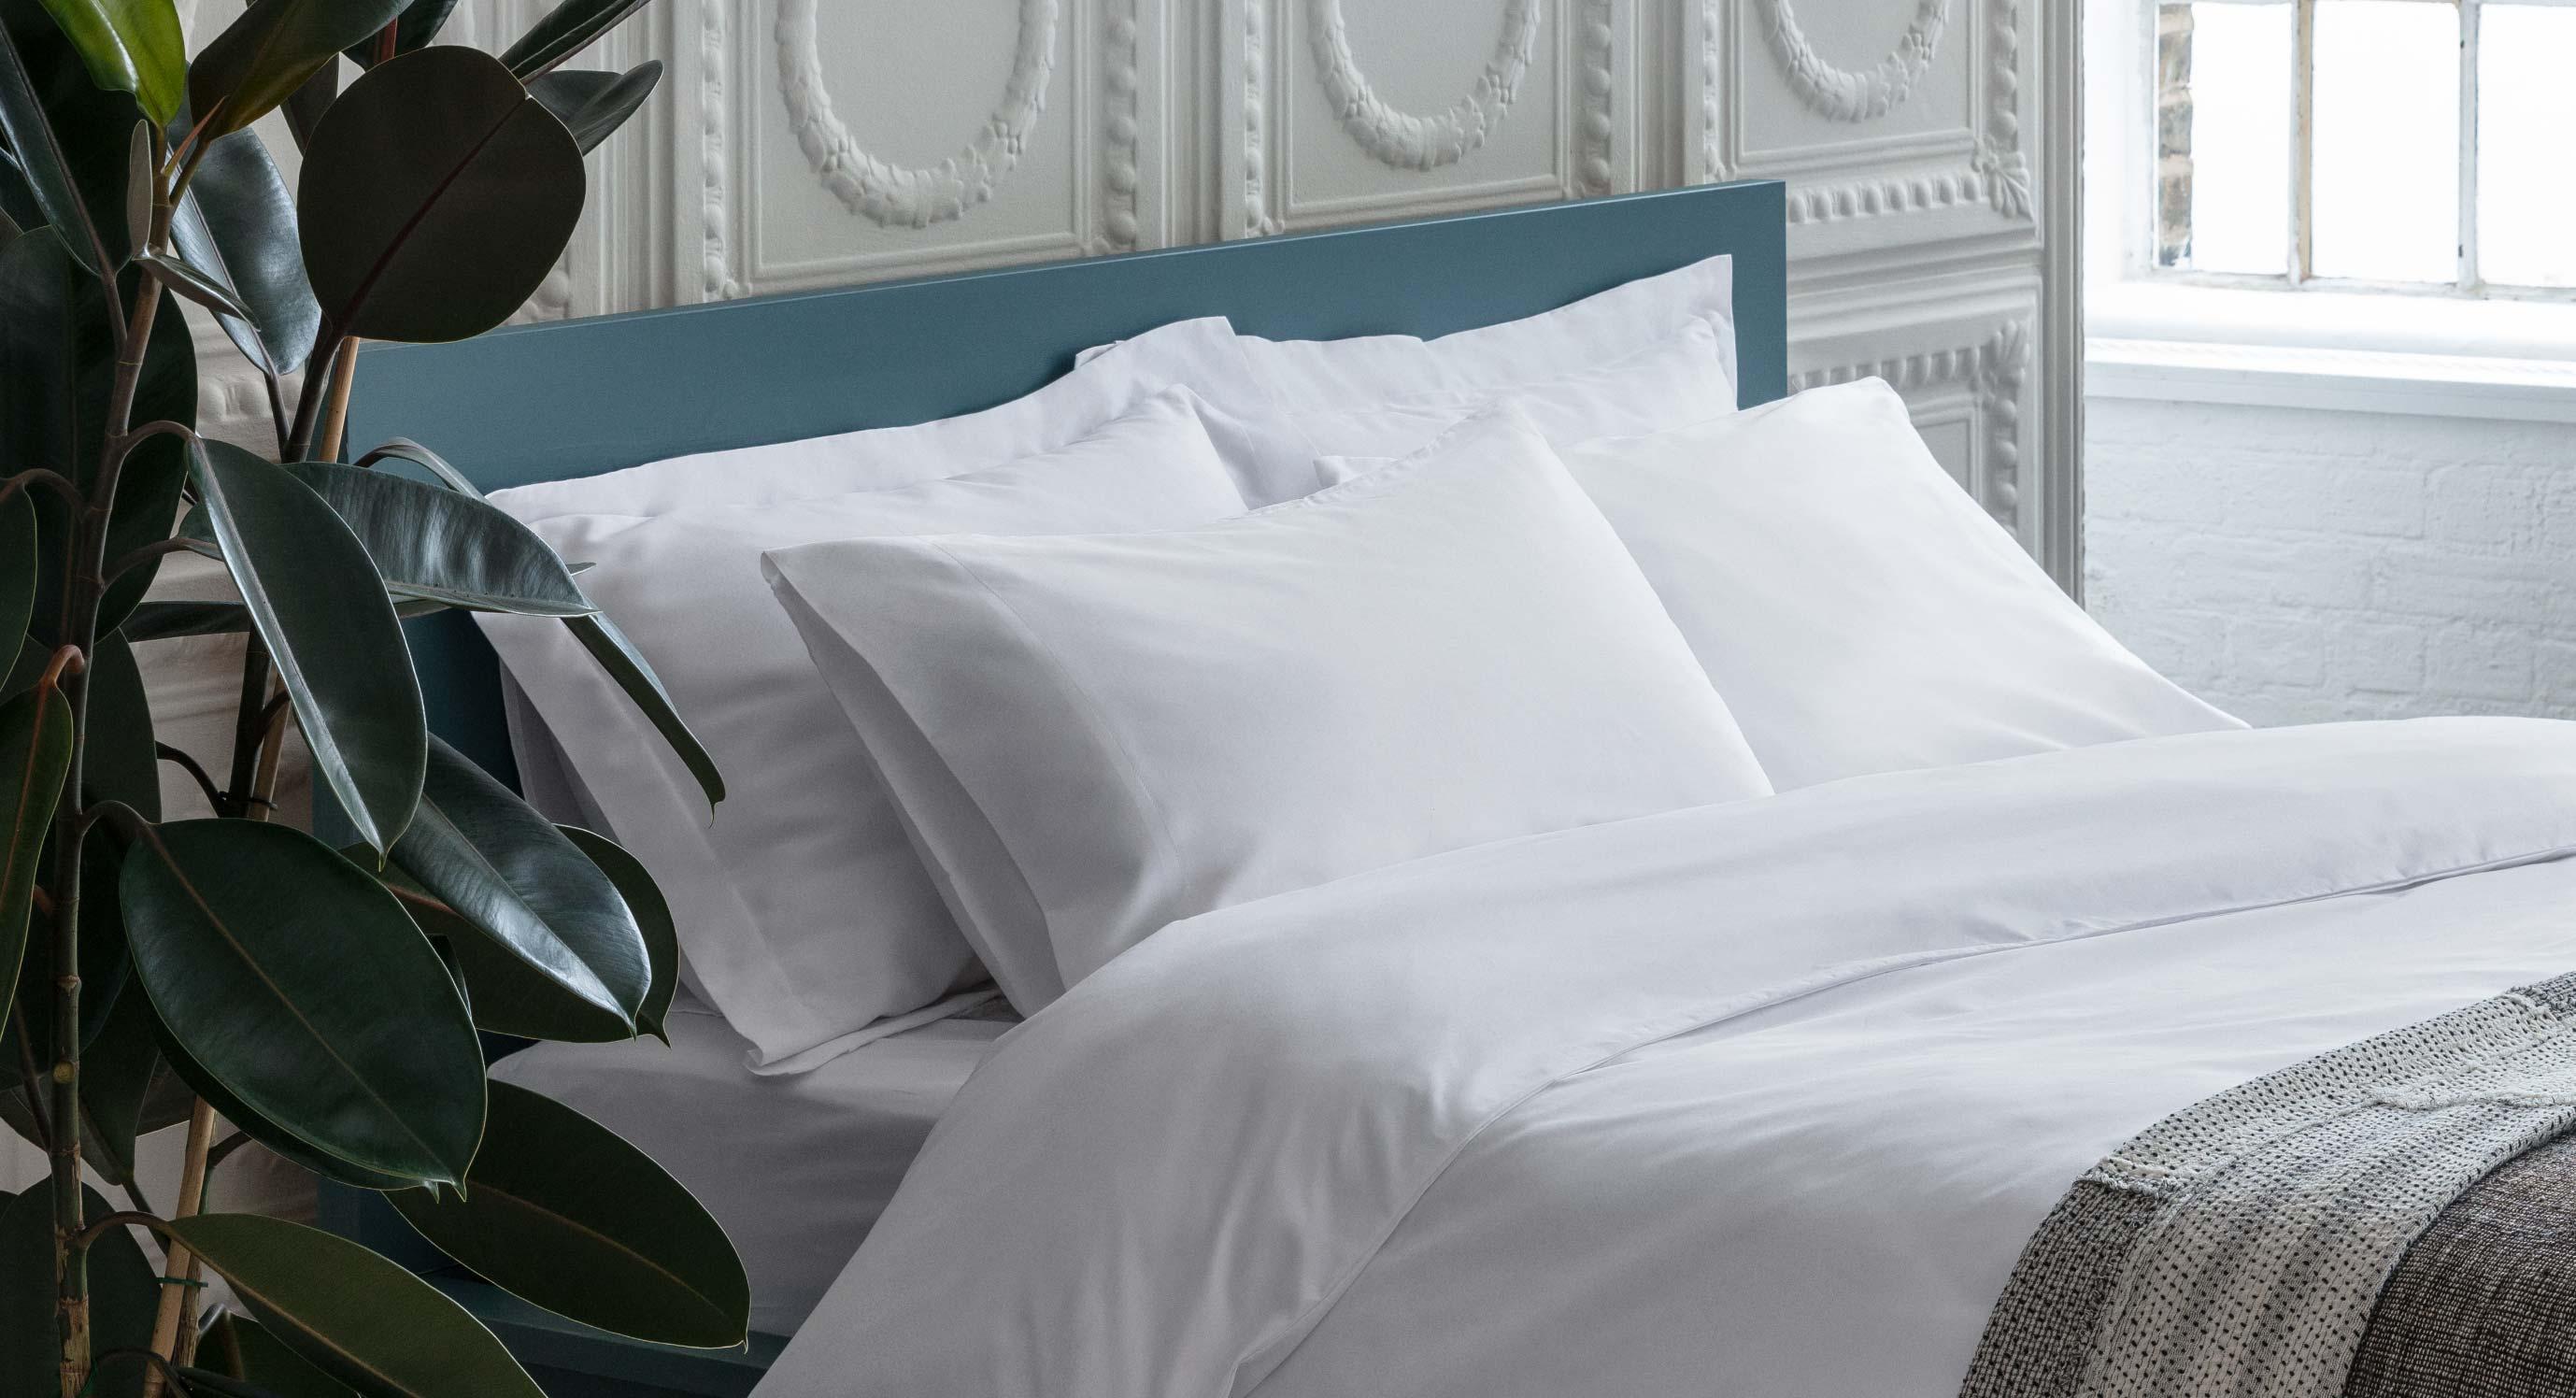 Meet Rise & Fall: The Secret To A Perfect Night's Sleep